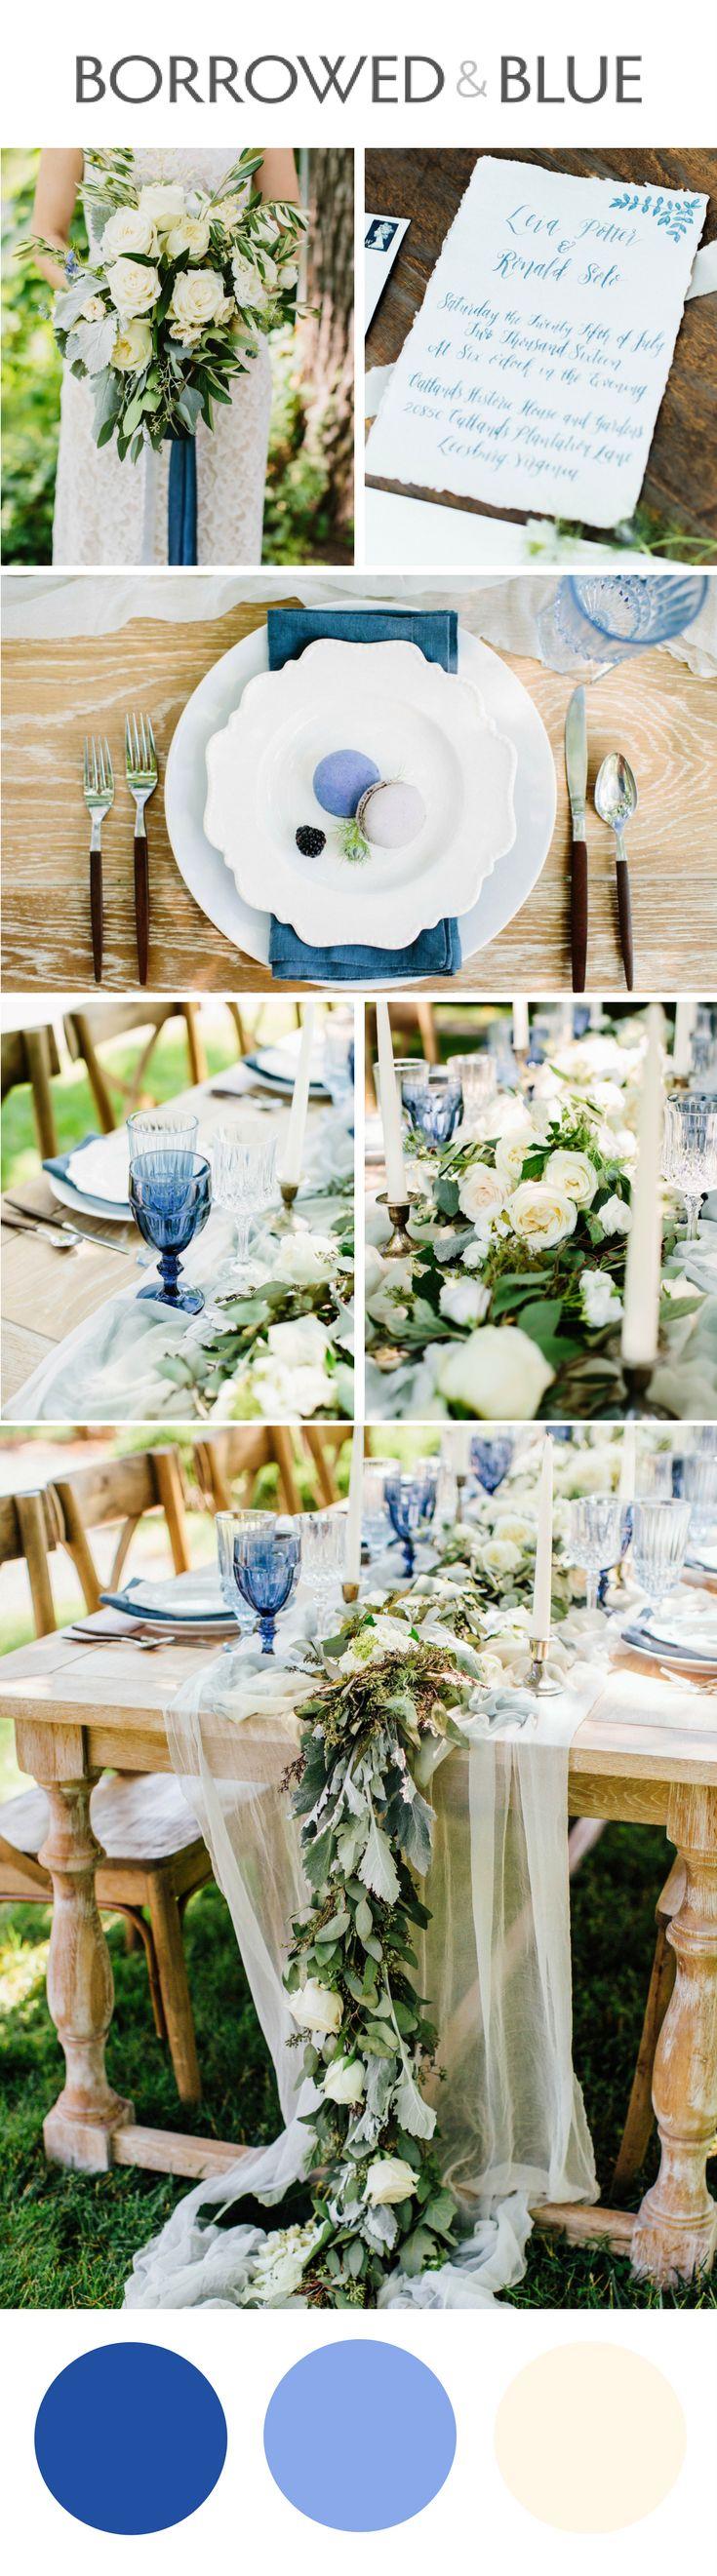 Cornflower blue French blue ivory gauzy runner